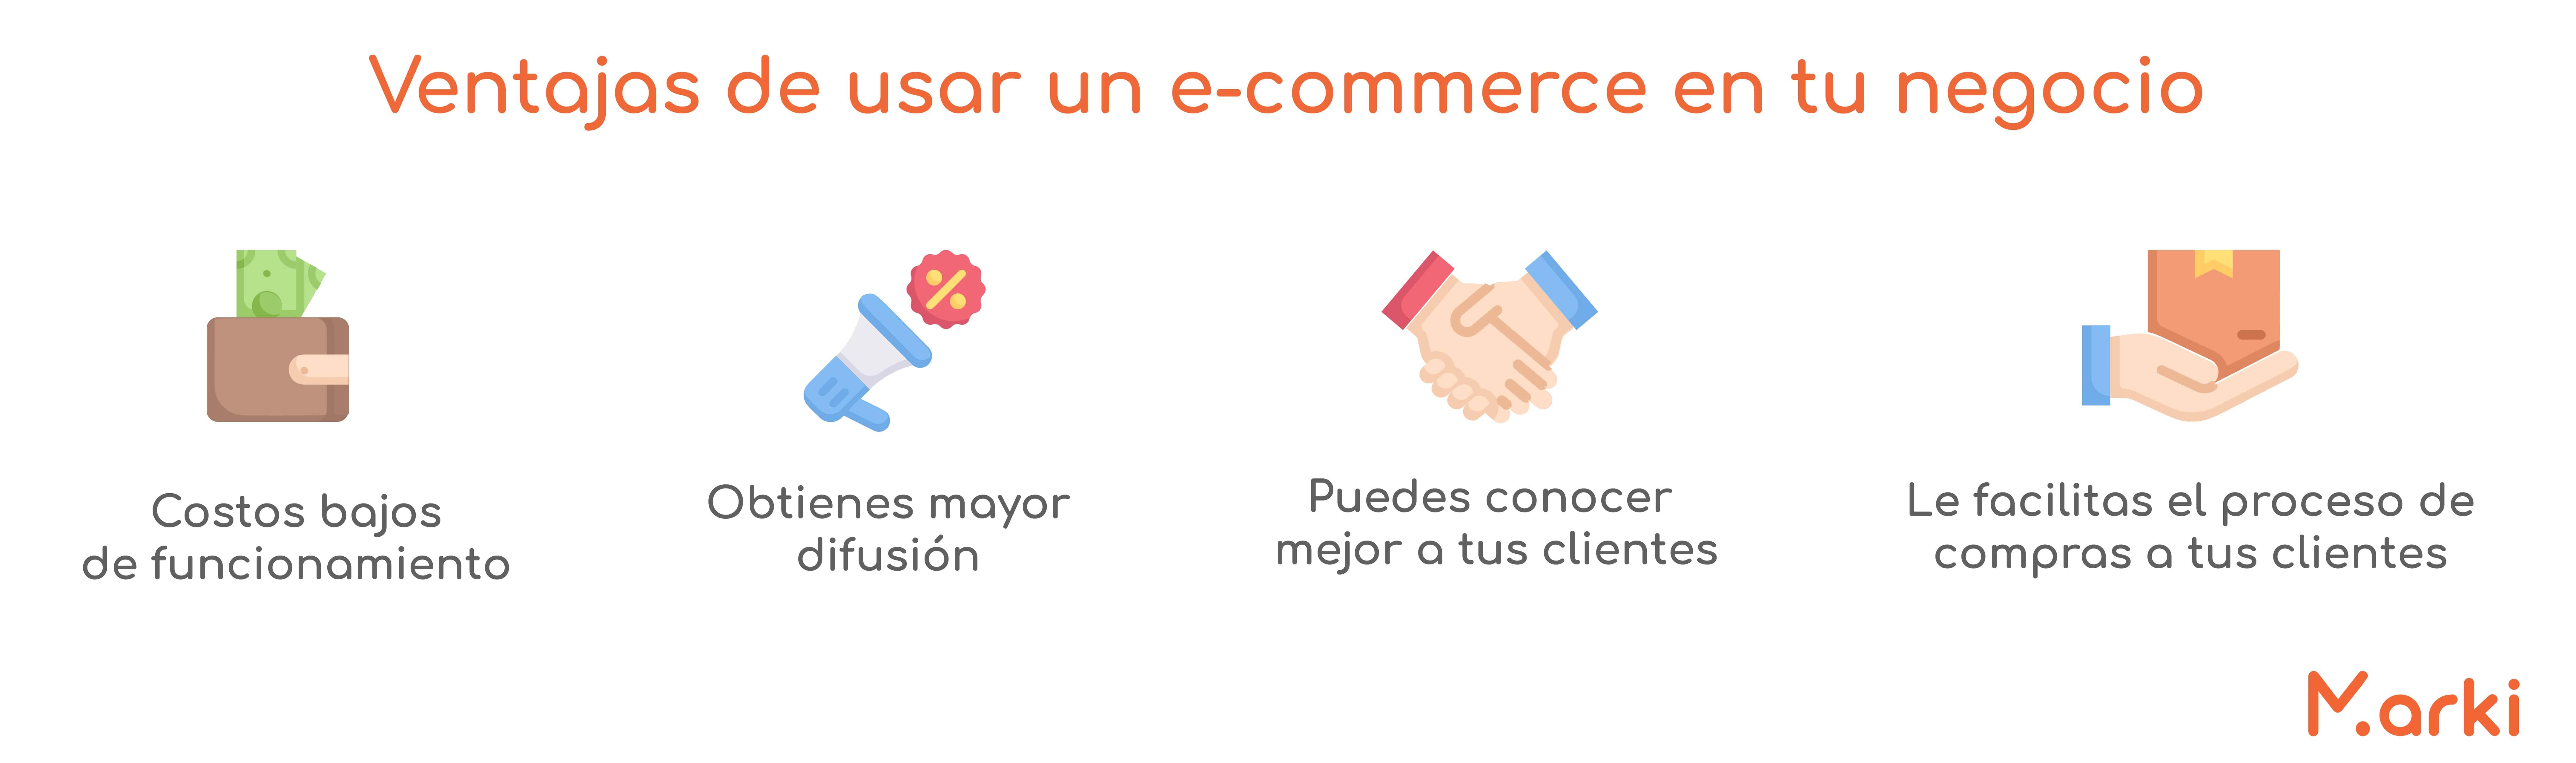 ventajas de un e-commerce